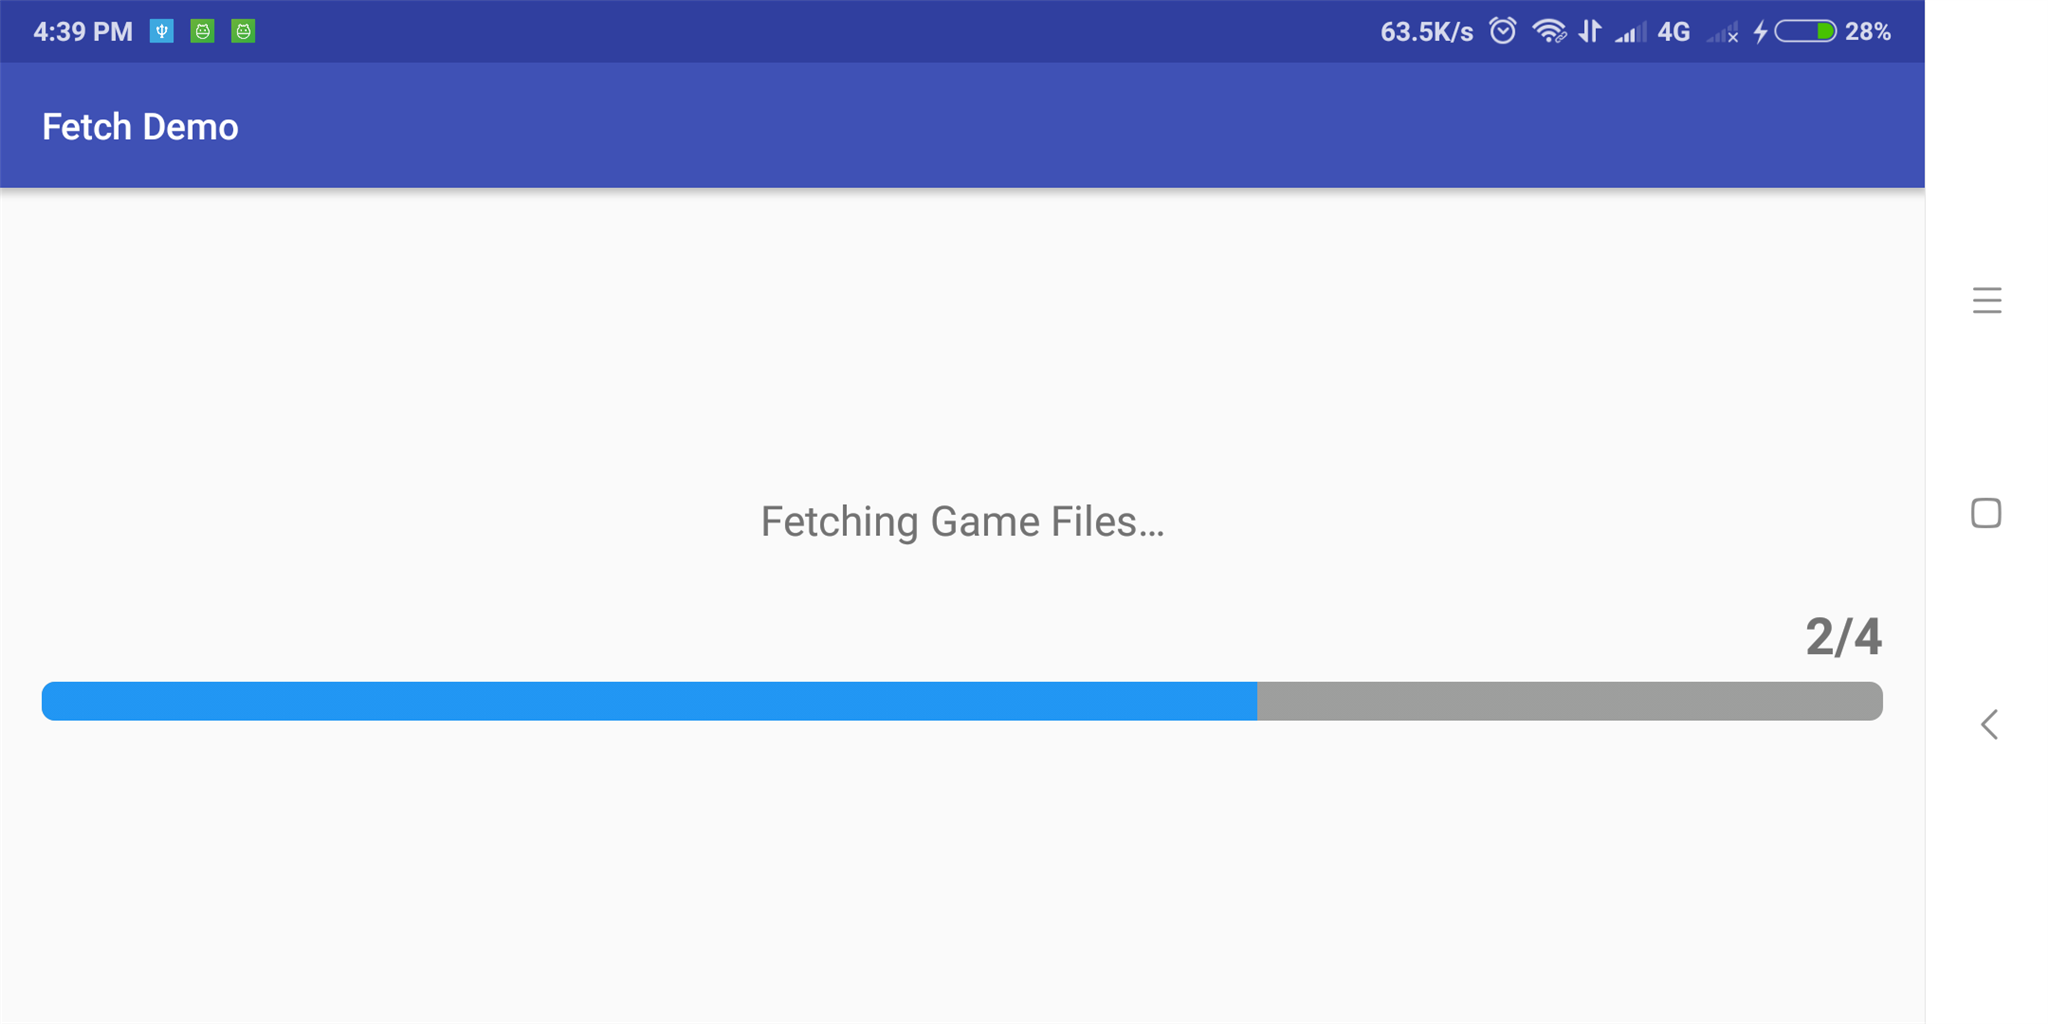 Fetch Download Progress